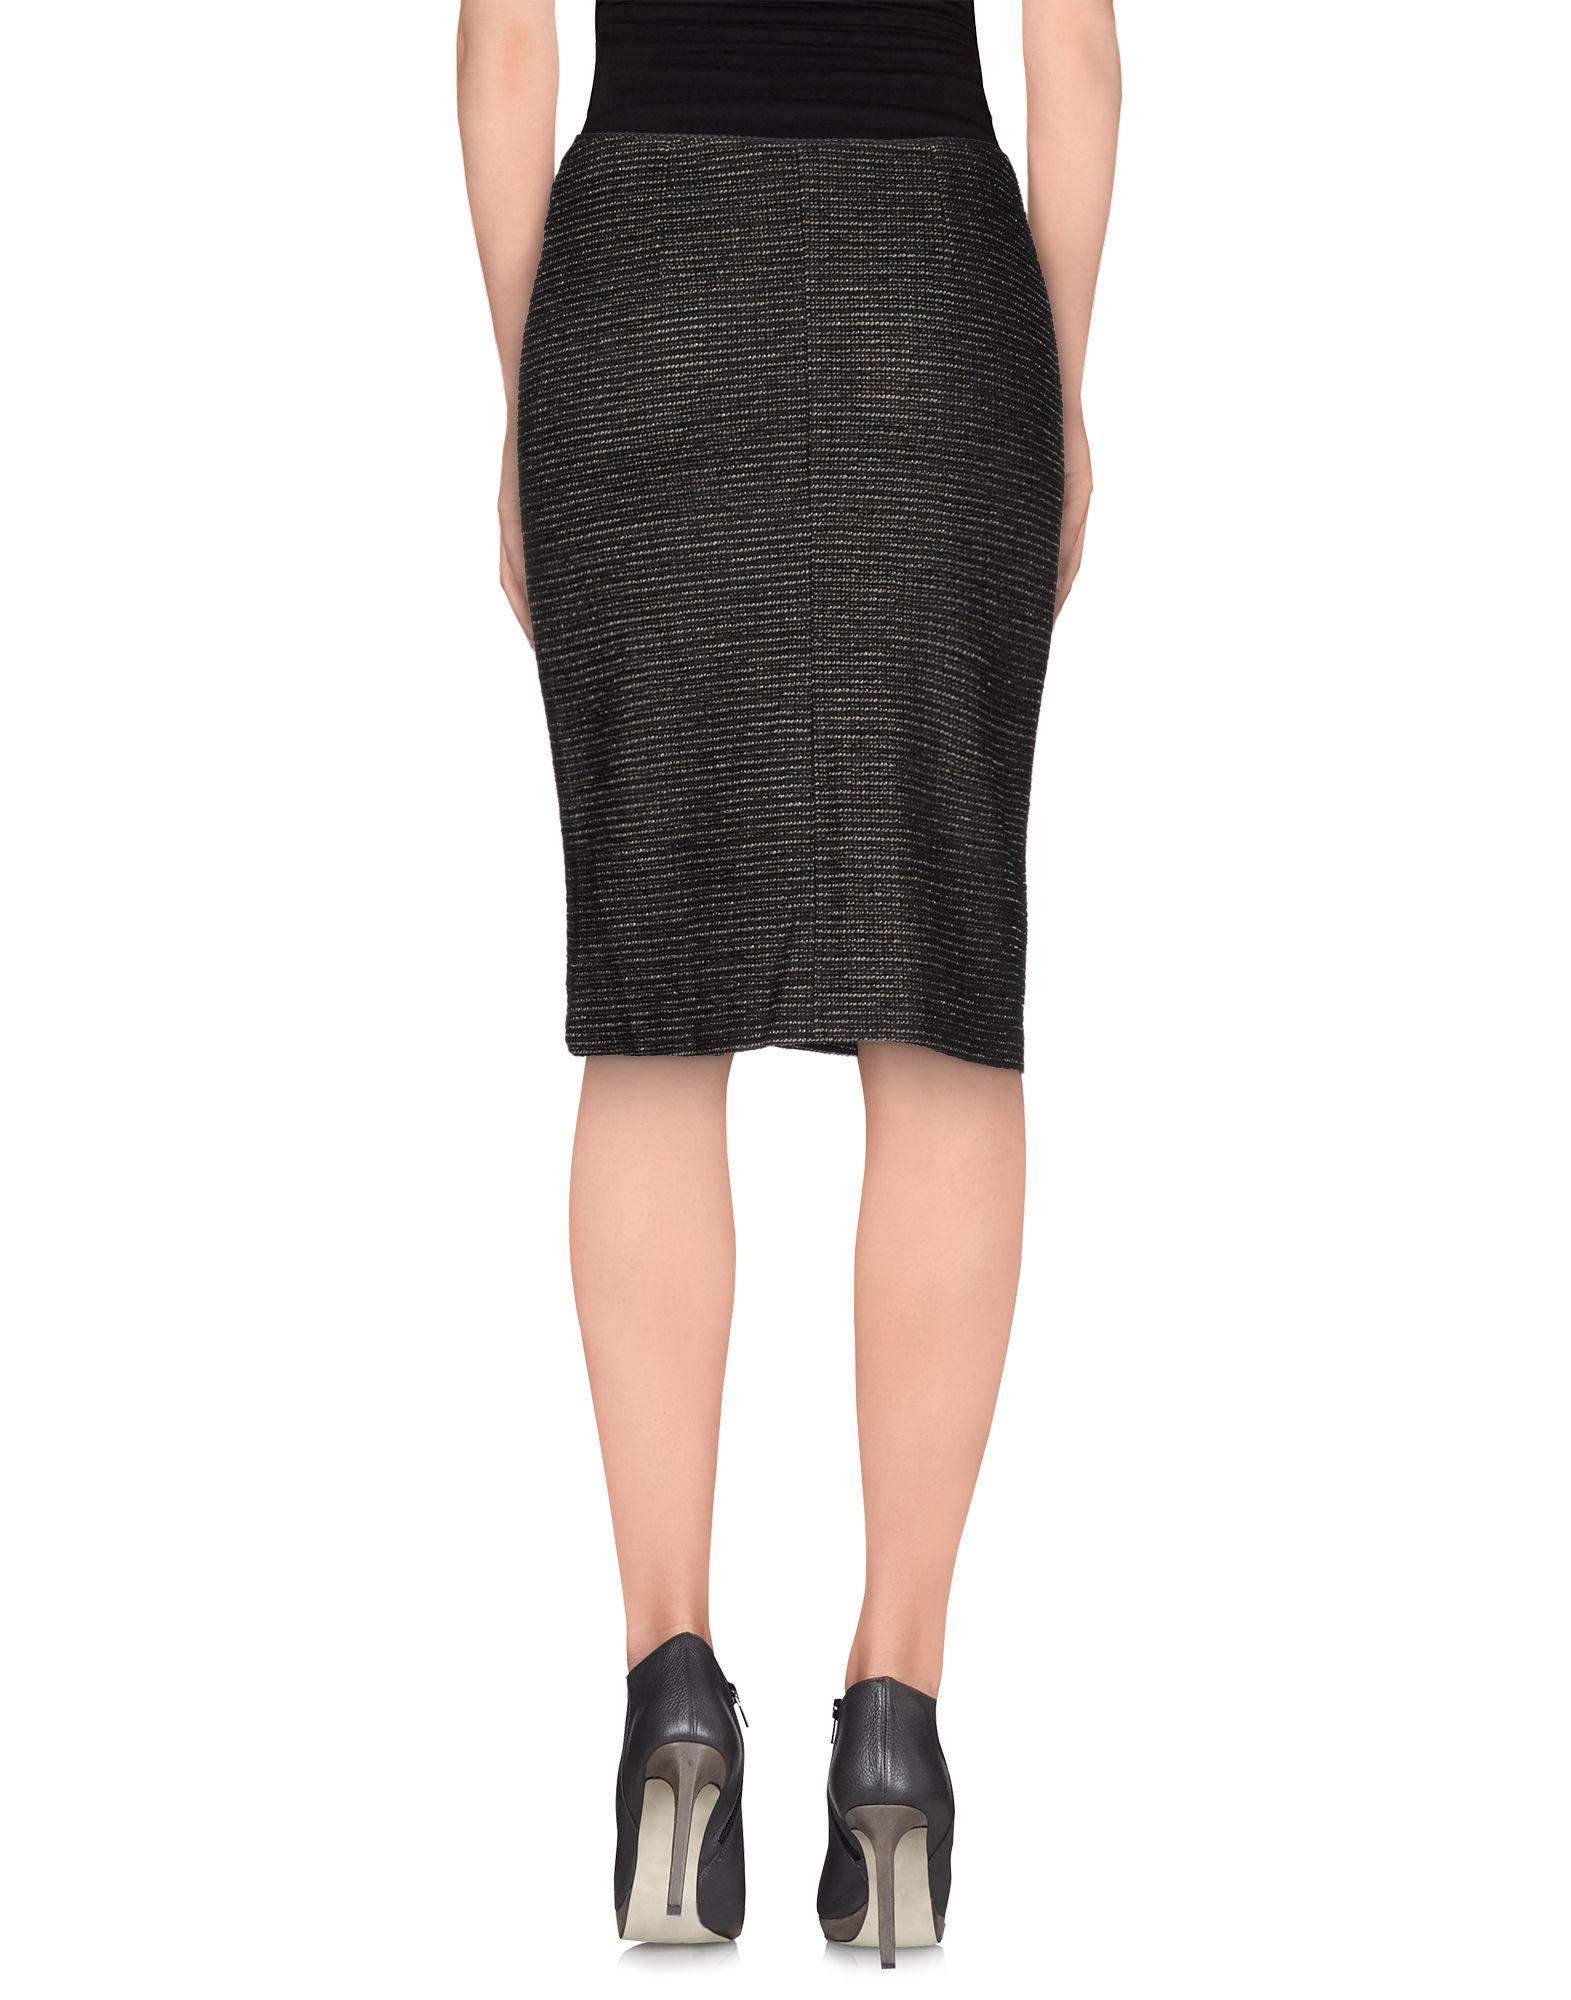 kooka 239 knee length skirt in black lyst